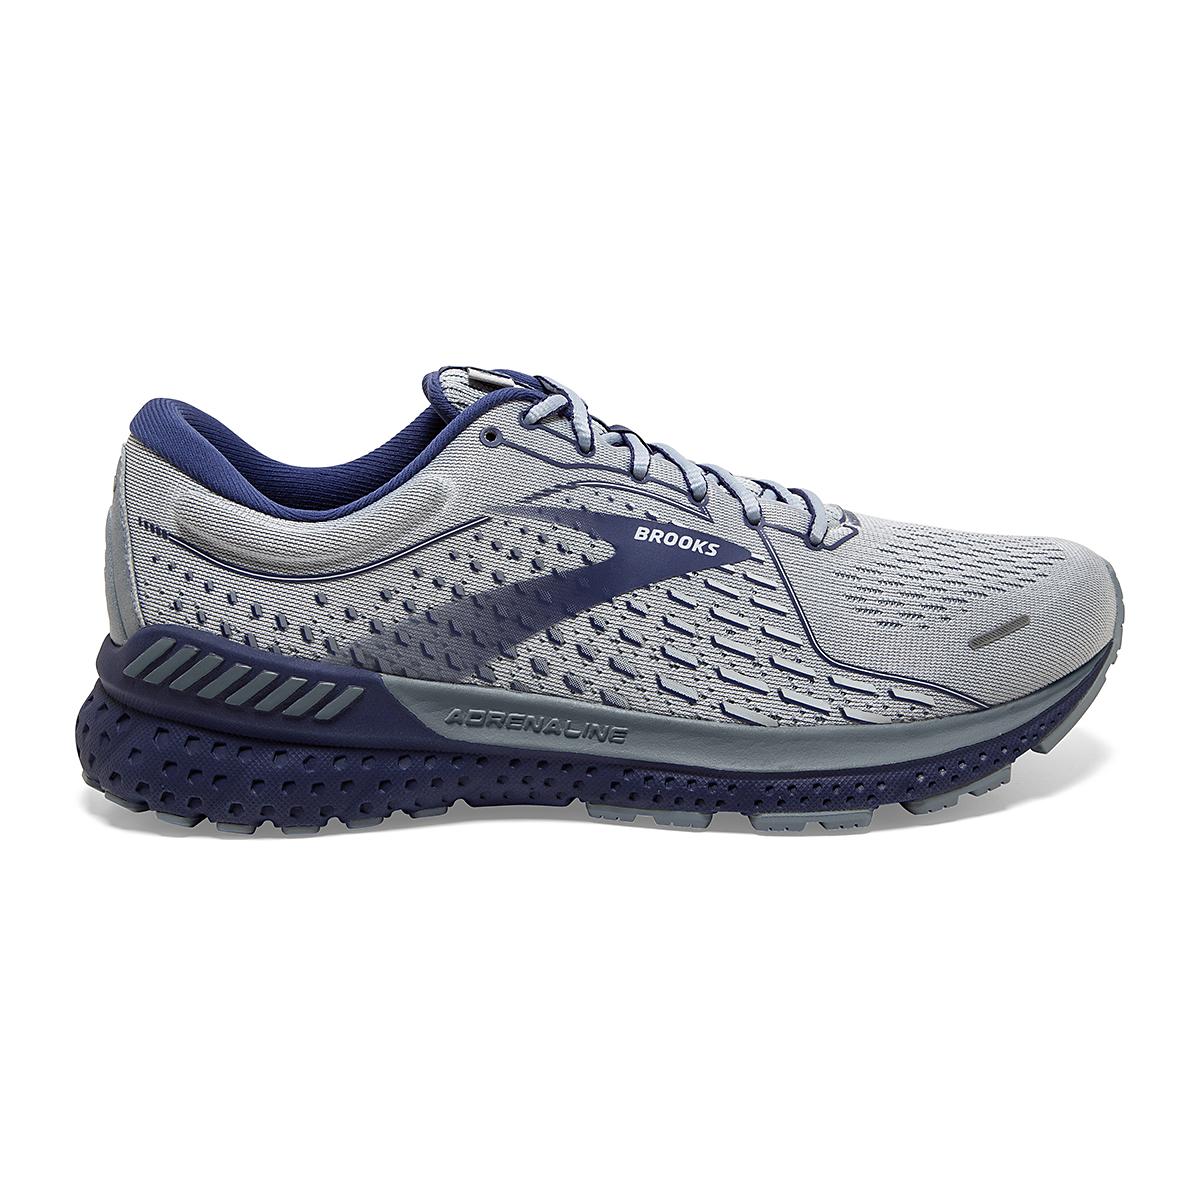 Men's Brooks Adrenaline GTS 21 Running Shoe - Color: Grey/Tradewinds - Size: 7 - Width: Regular, Grey/Tradewinds, large, image 1